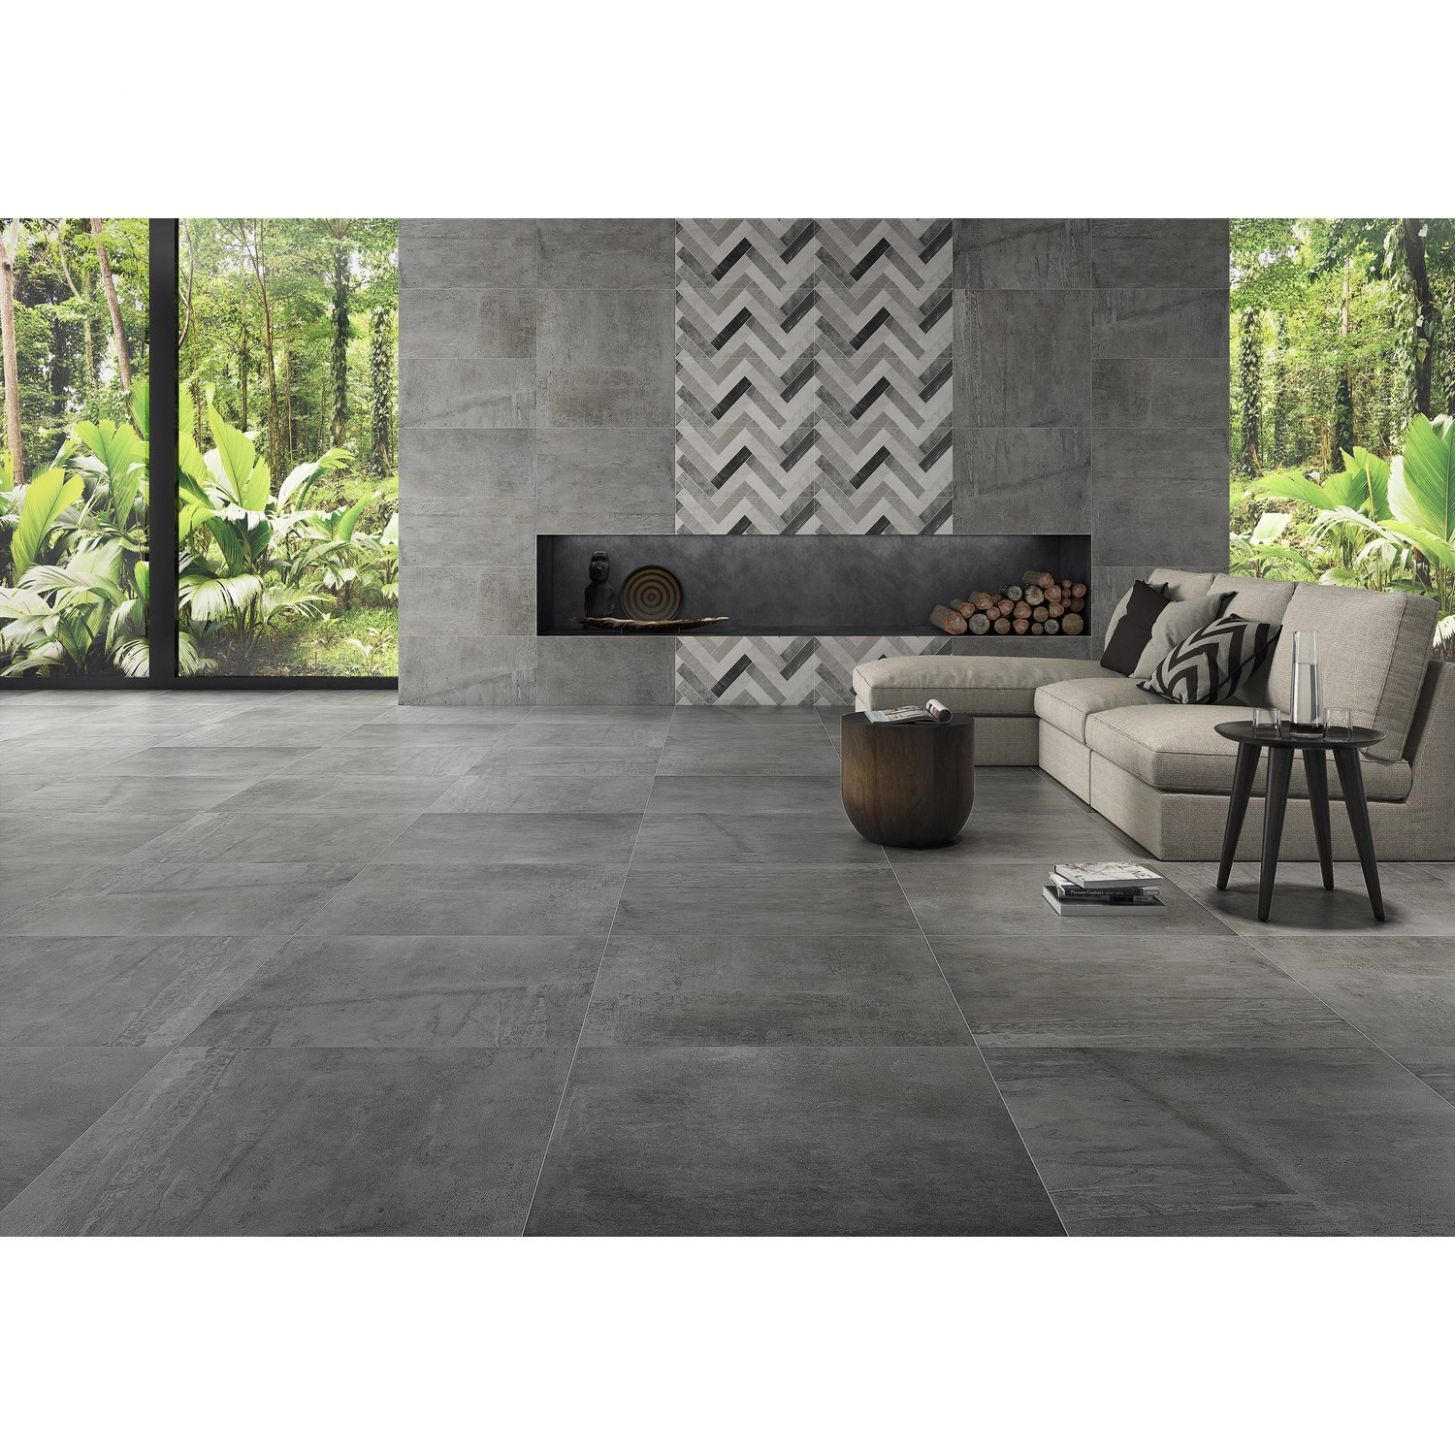 5 Einfache Regeln Von Obi Kuchenboden Obi Kuchenboden In 2020 Home Decor Matt Porcelain Tiles Living Spaces